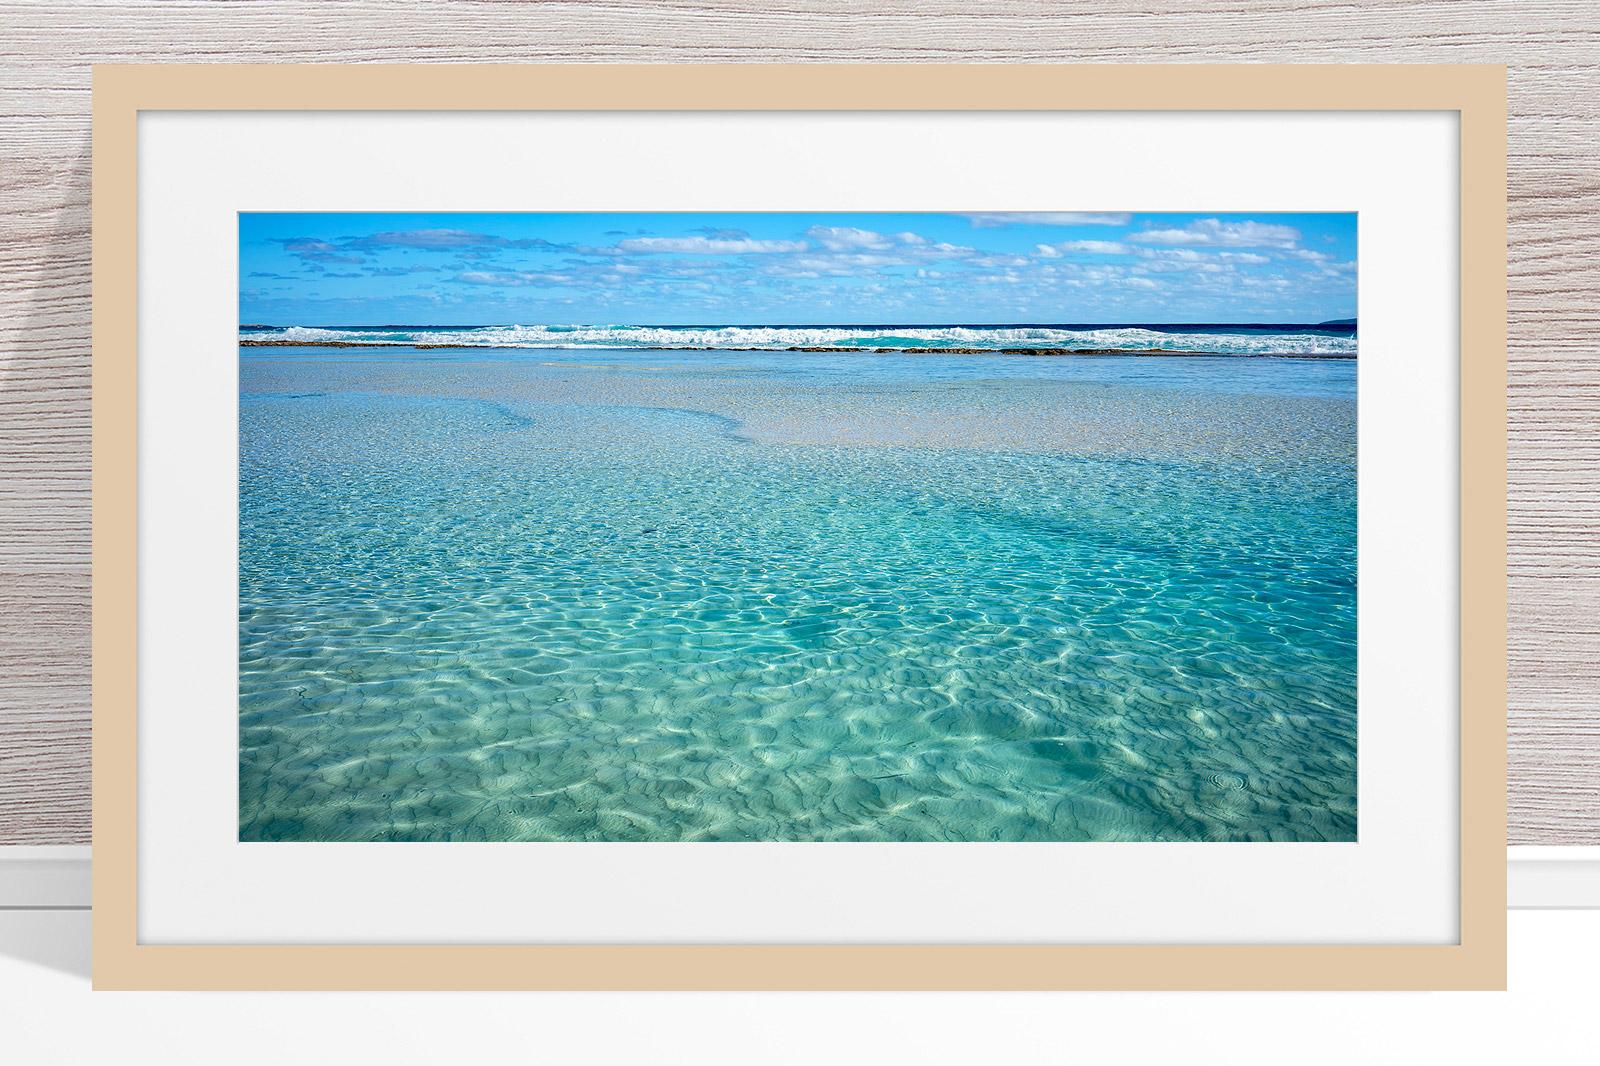 002 - Jason Mazur - 'Crystal Clear Waters, Esperance' Light Frame